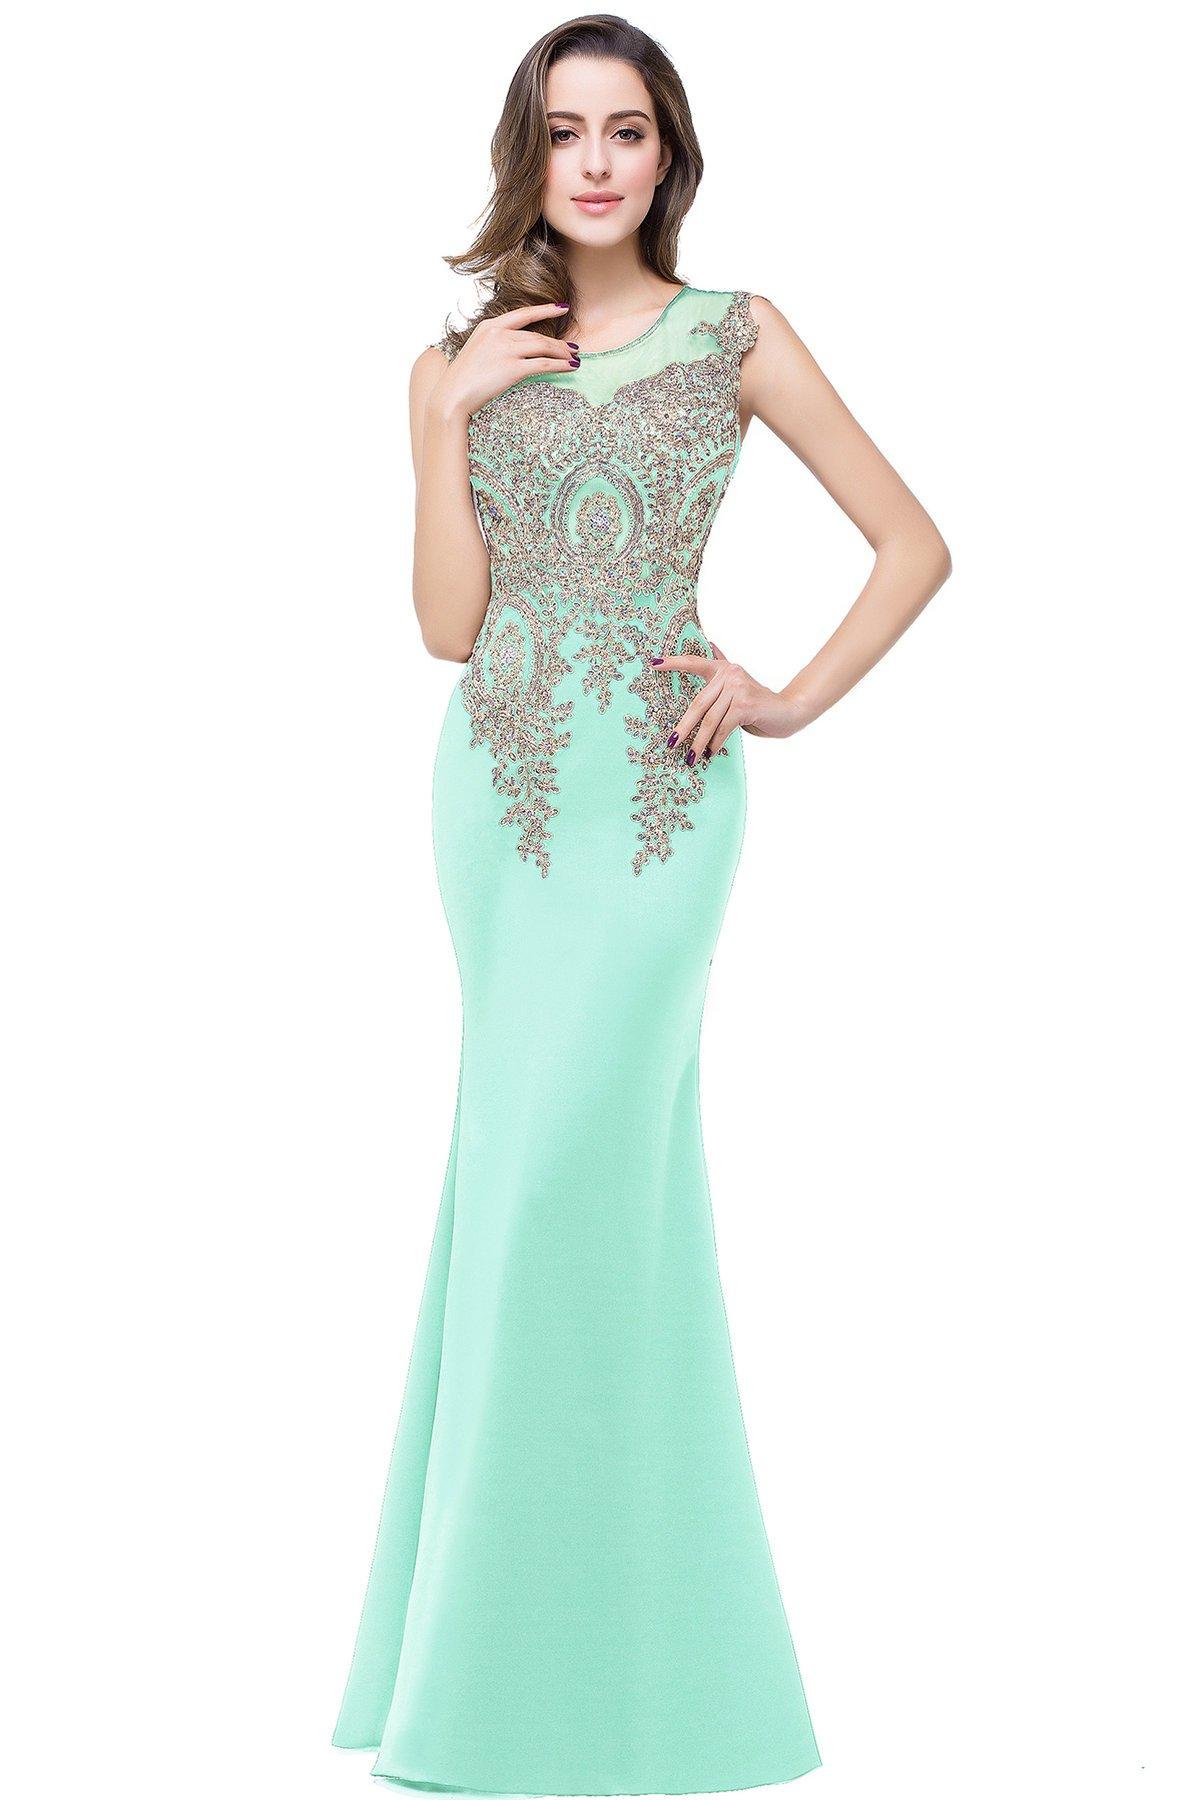 MisShow Womens Rhinestone Long Lace Formal Mermaid Evening Prom Dresses